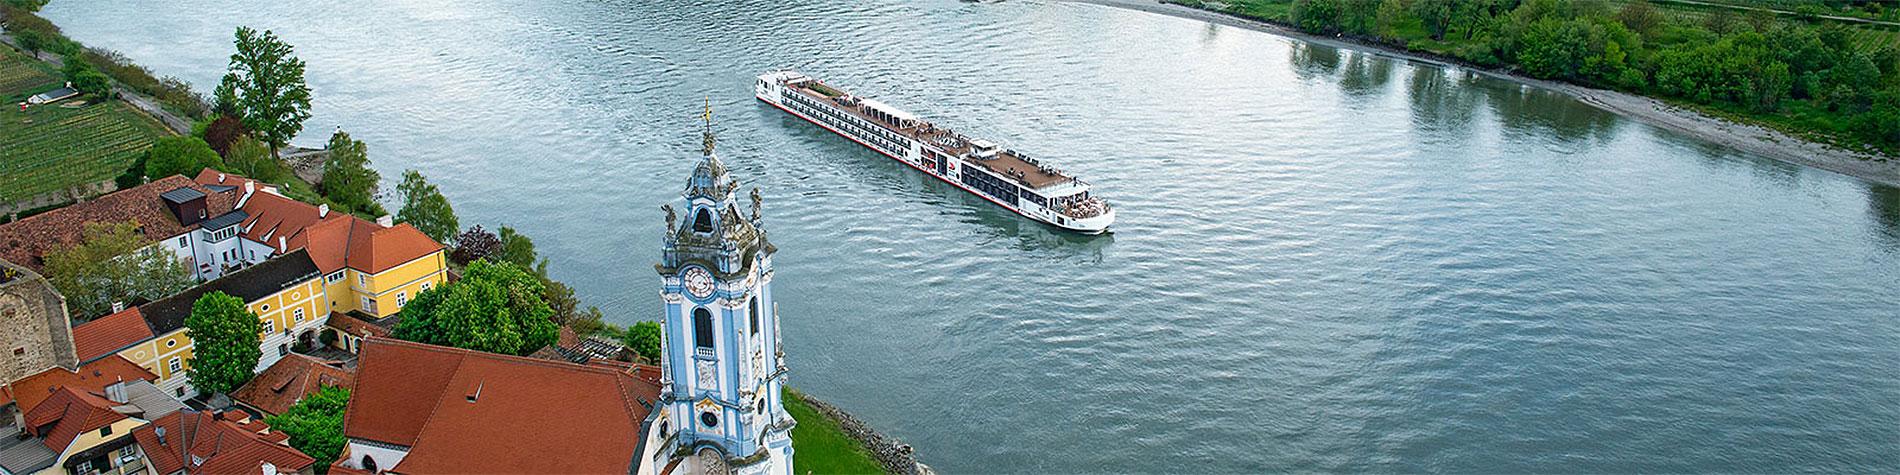 Viking River Cruises Travel Agent Website